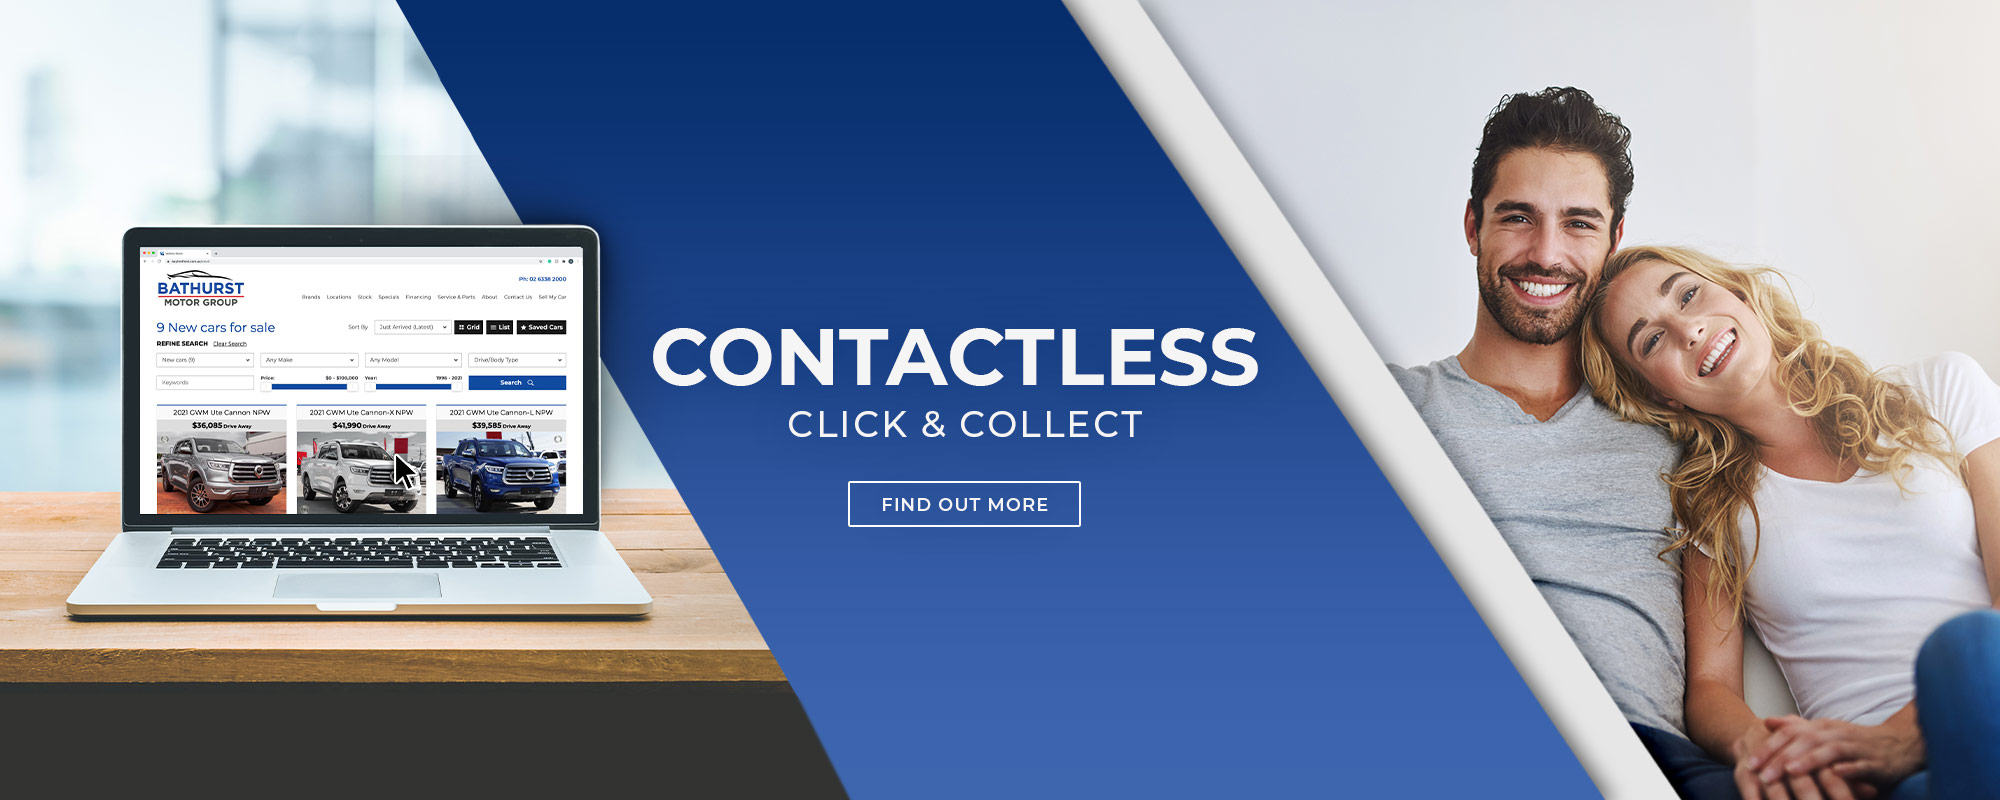 Bathurstmotors Contactless